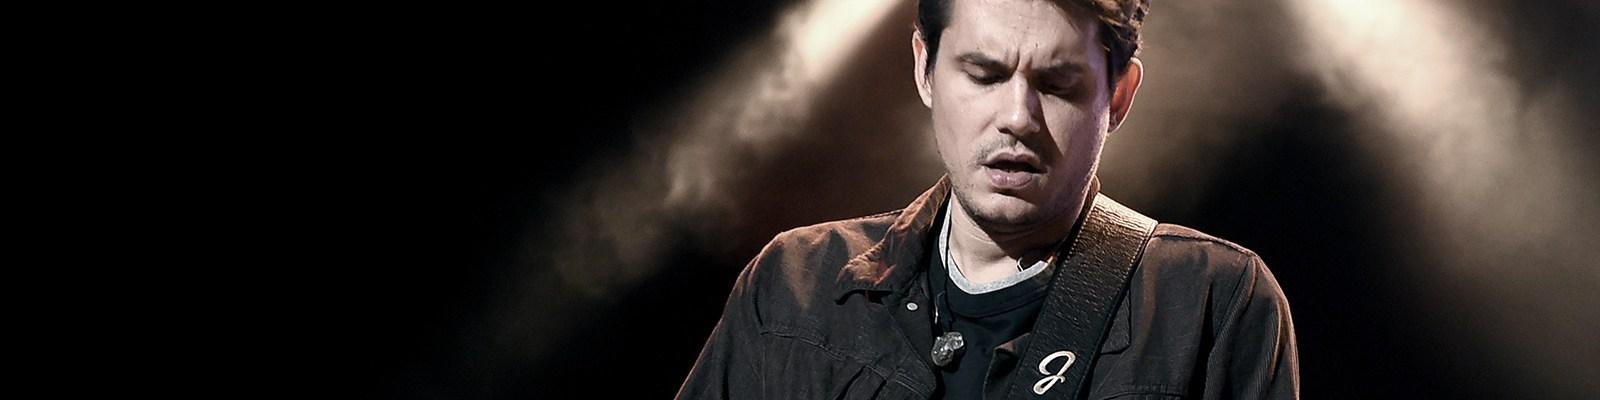 John Mayer Embraces His Inner Tuneful Cheeseball On 'Sob Rock'